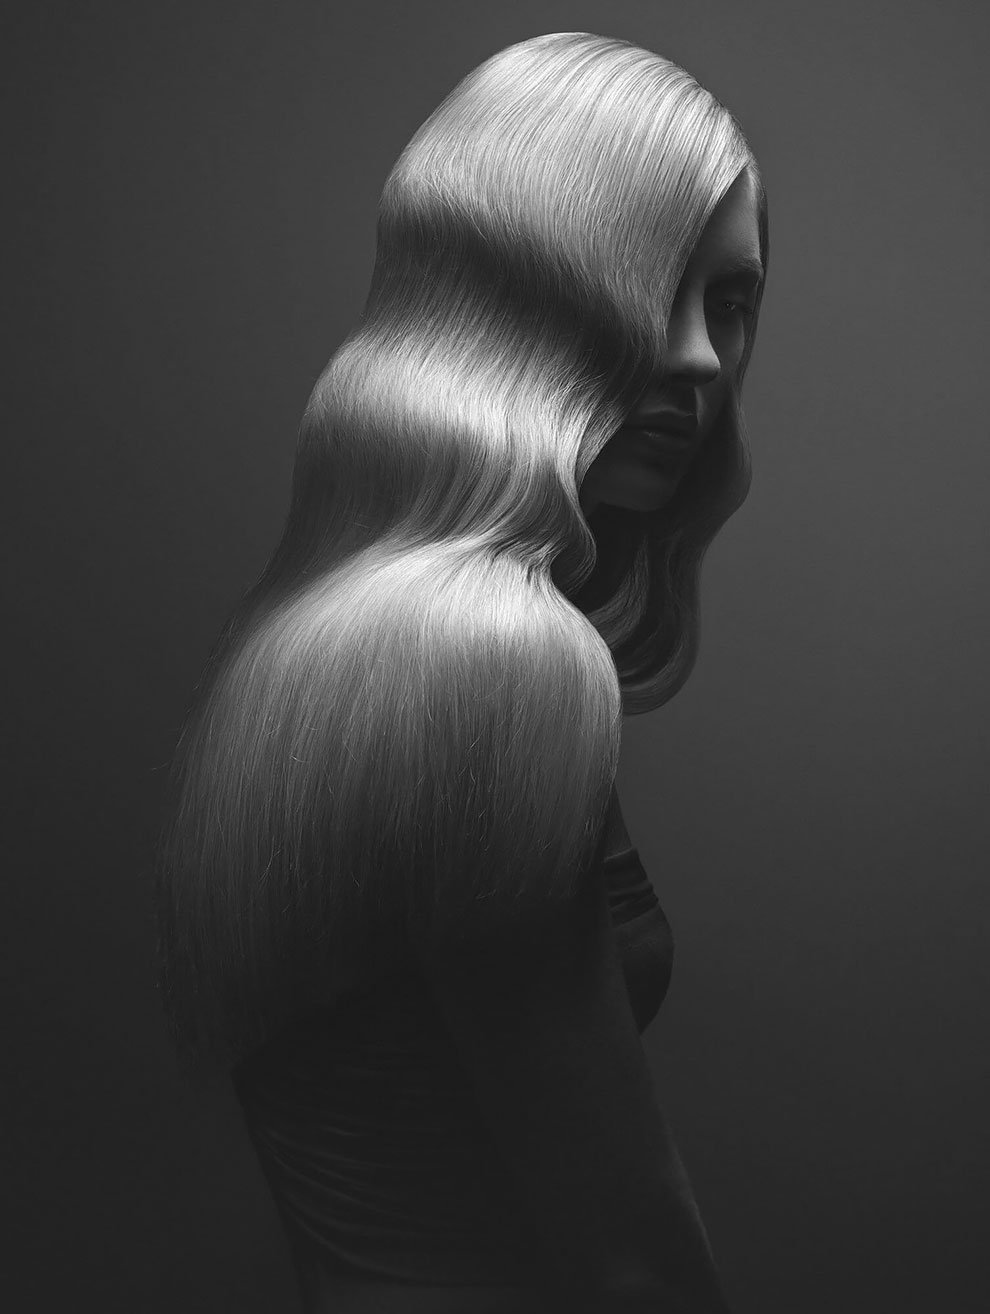 duke fotografia, duke el blog, blog de fotografia, hasselblad master awards,